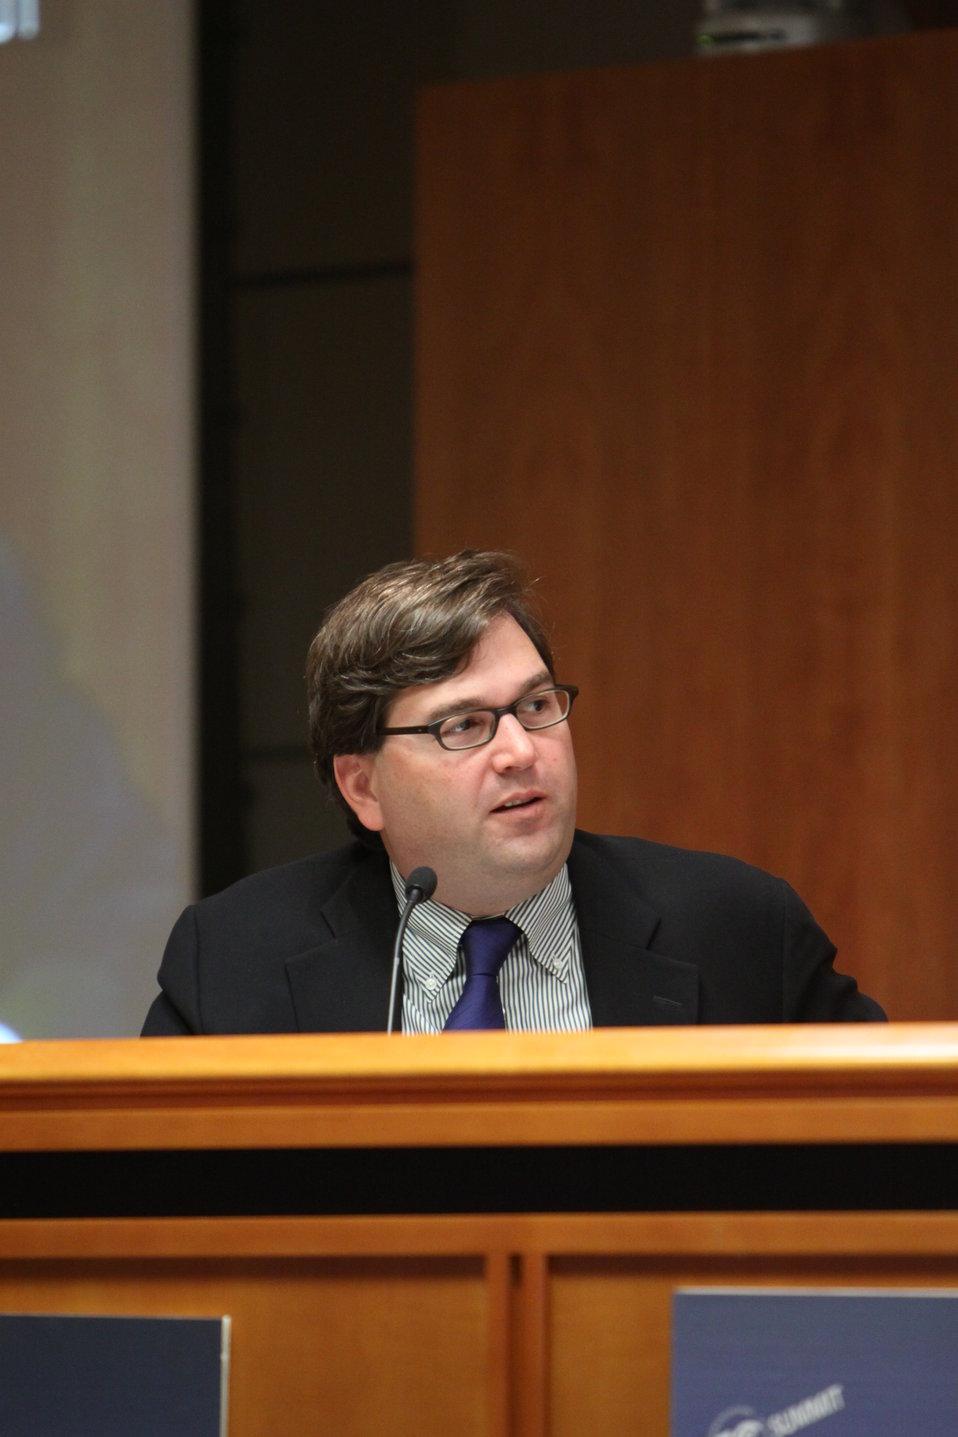 Moderator Jason Furman, Deputy Director, National Economic Council